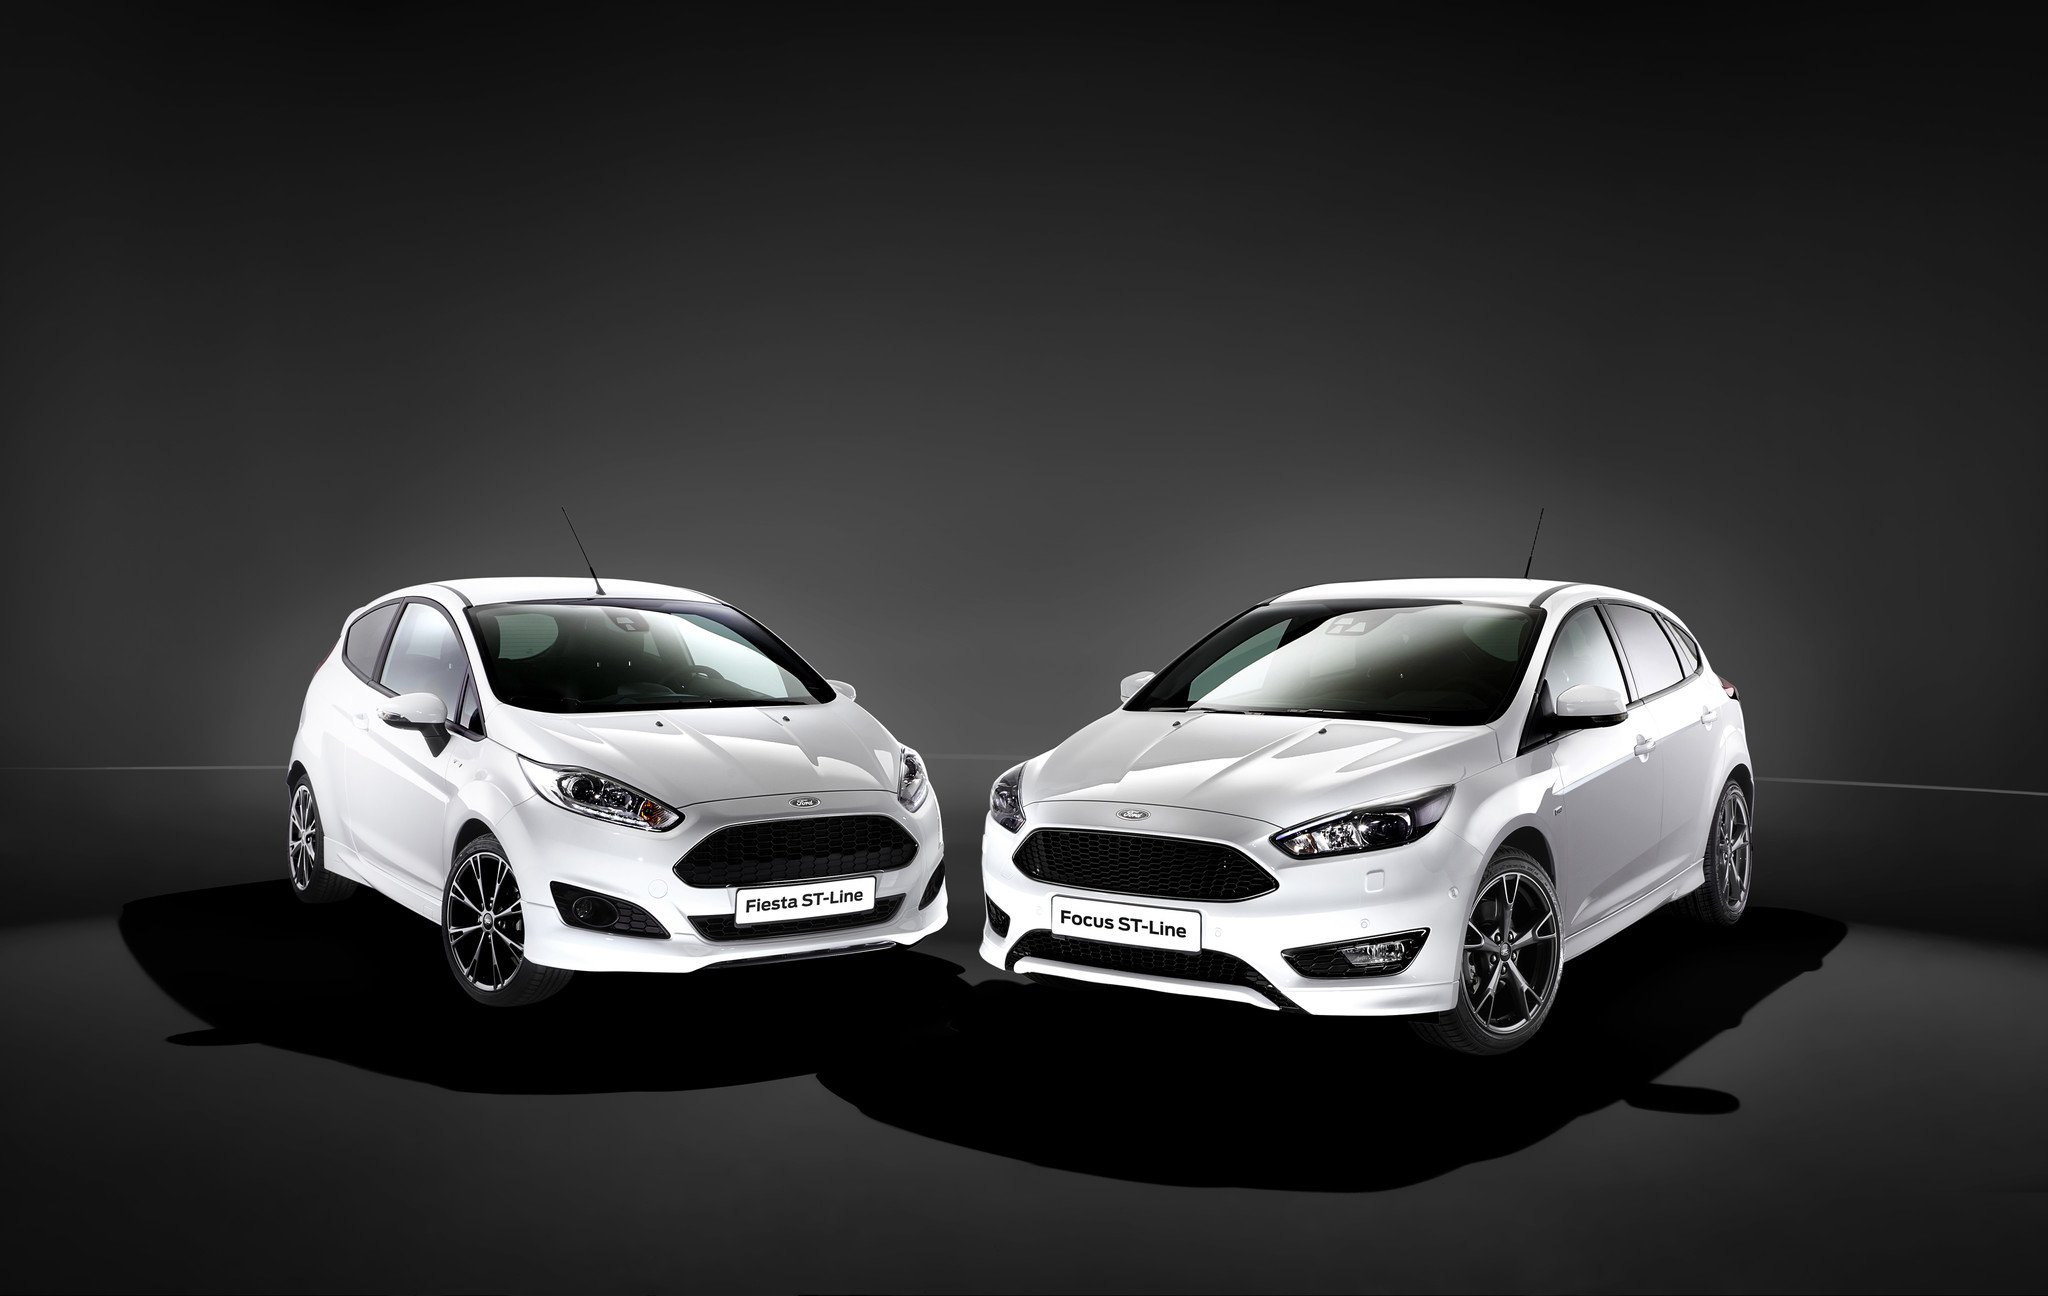 Ford Fiesta y Focus ST-Line